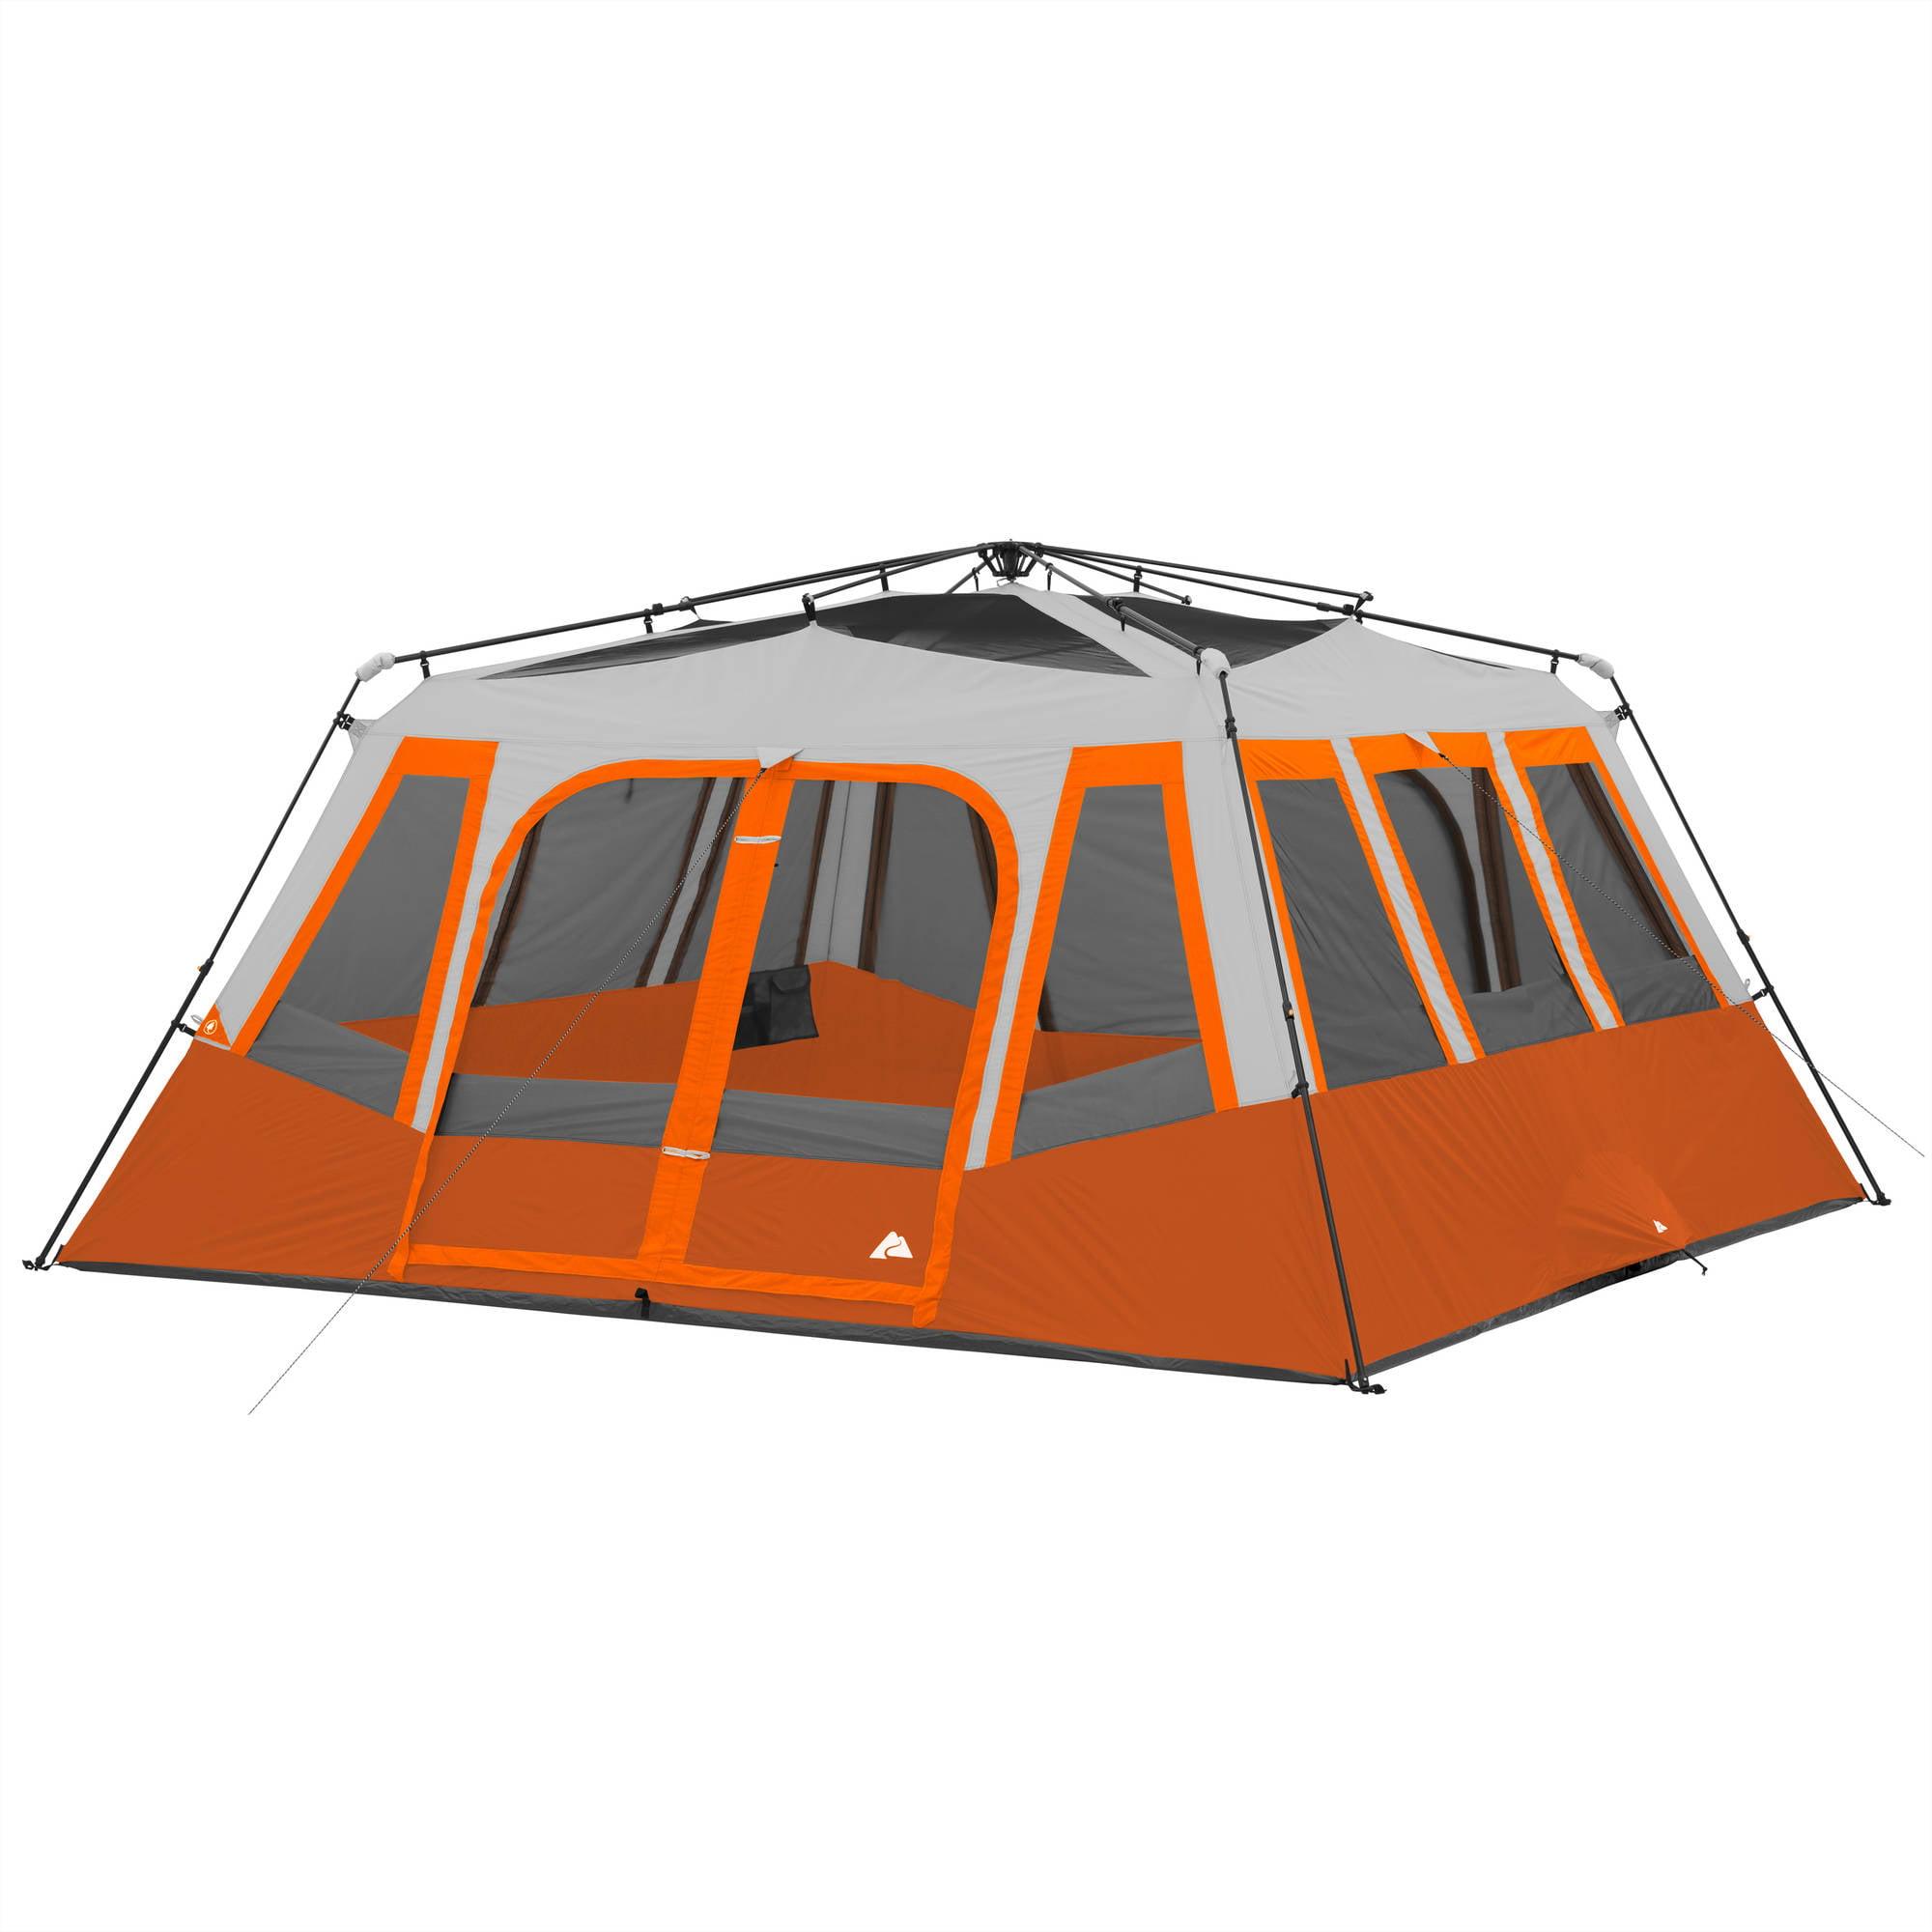 Ozark Trail 14 Person 2 Room Instant Cabin Tent Walmartcom